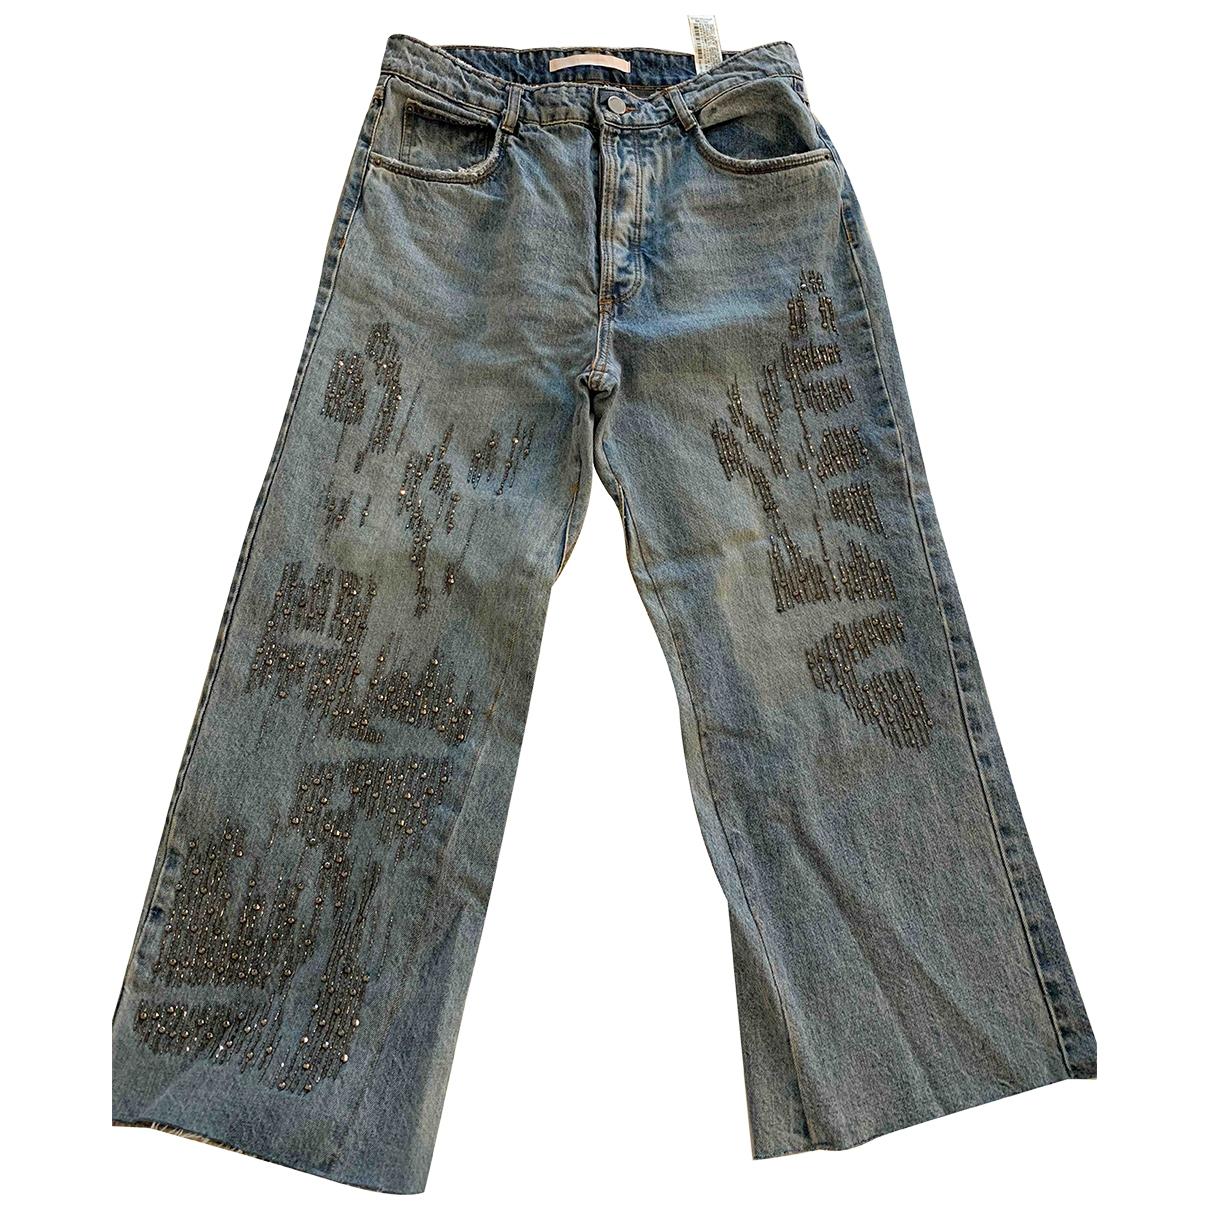 Zara \N Turquoise Denim - Jeans Trousers for Women 36 FR